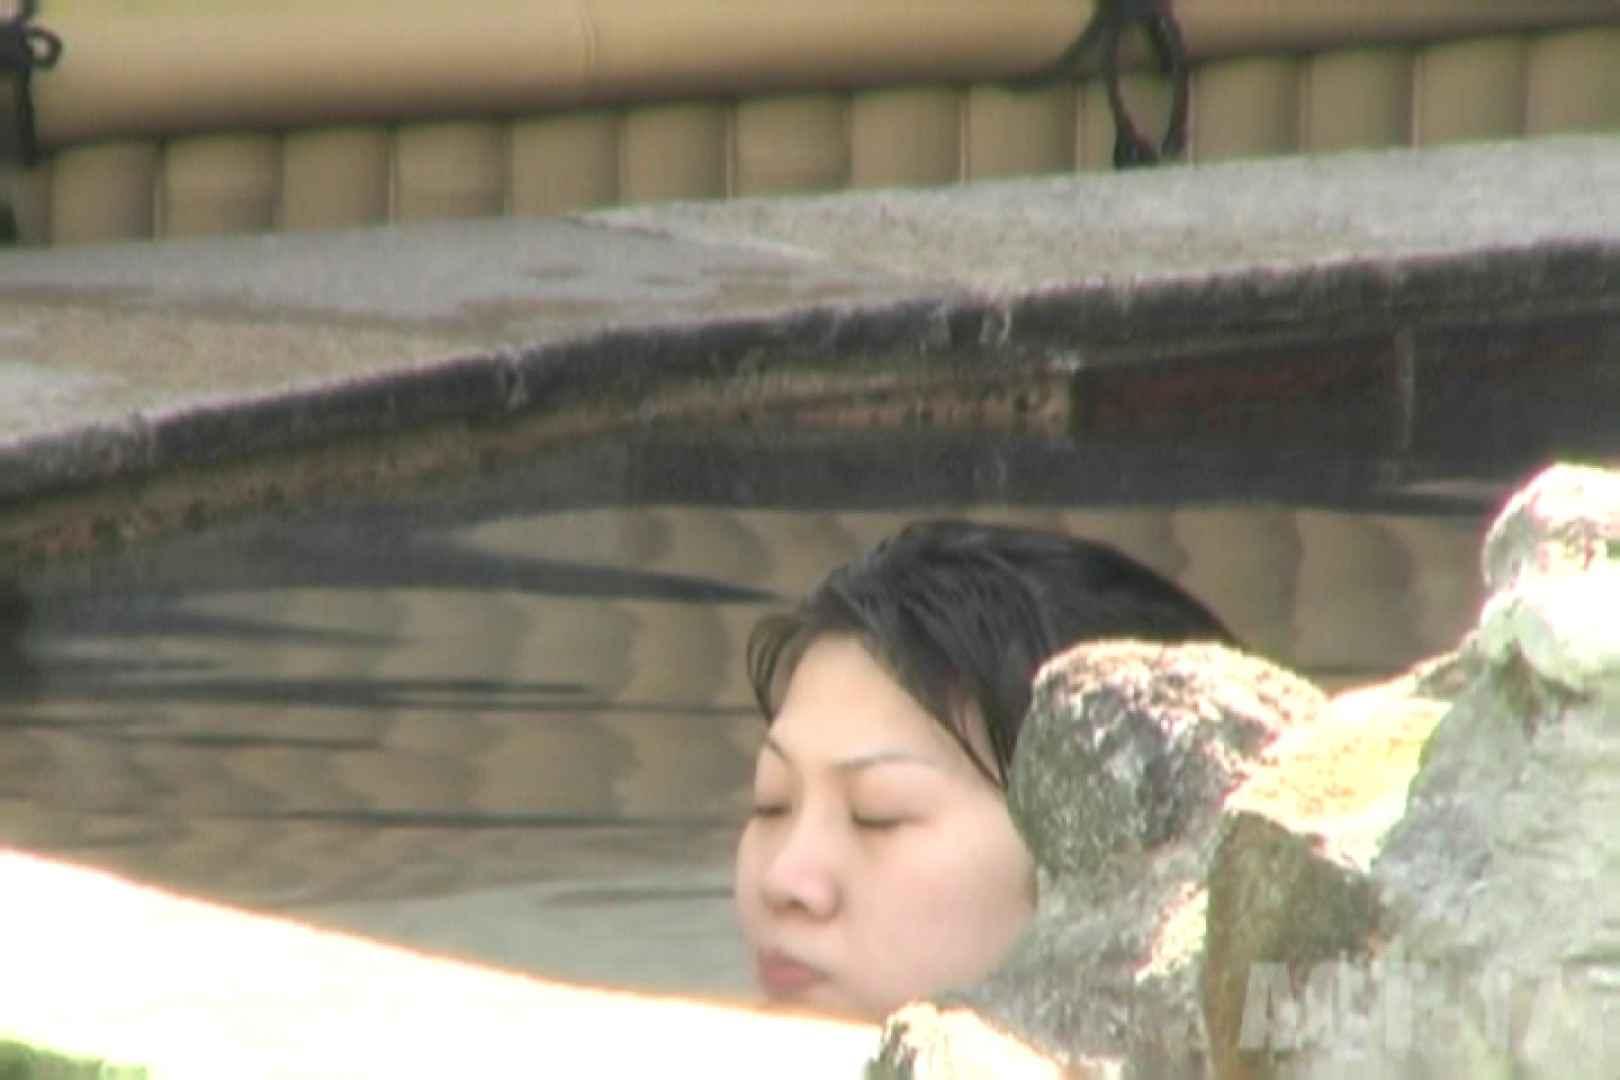 Aquaな露天風呂Vol.850 OLのエロ生活 | 露天風呂  76連発 31